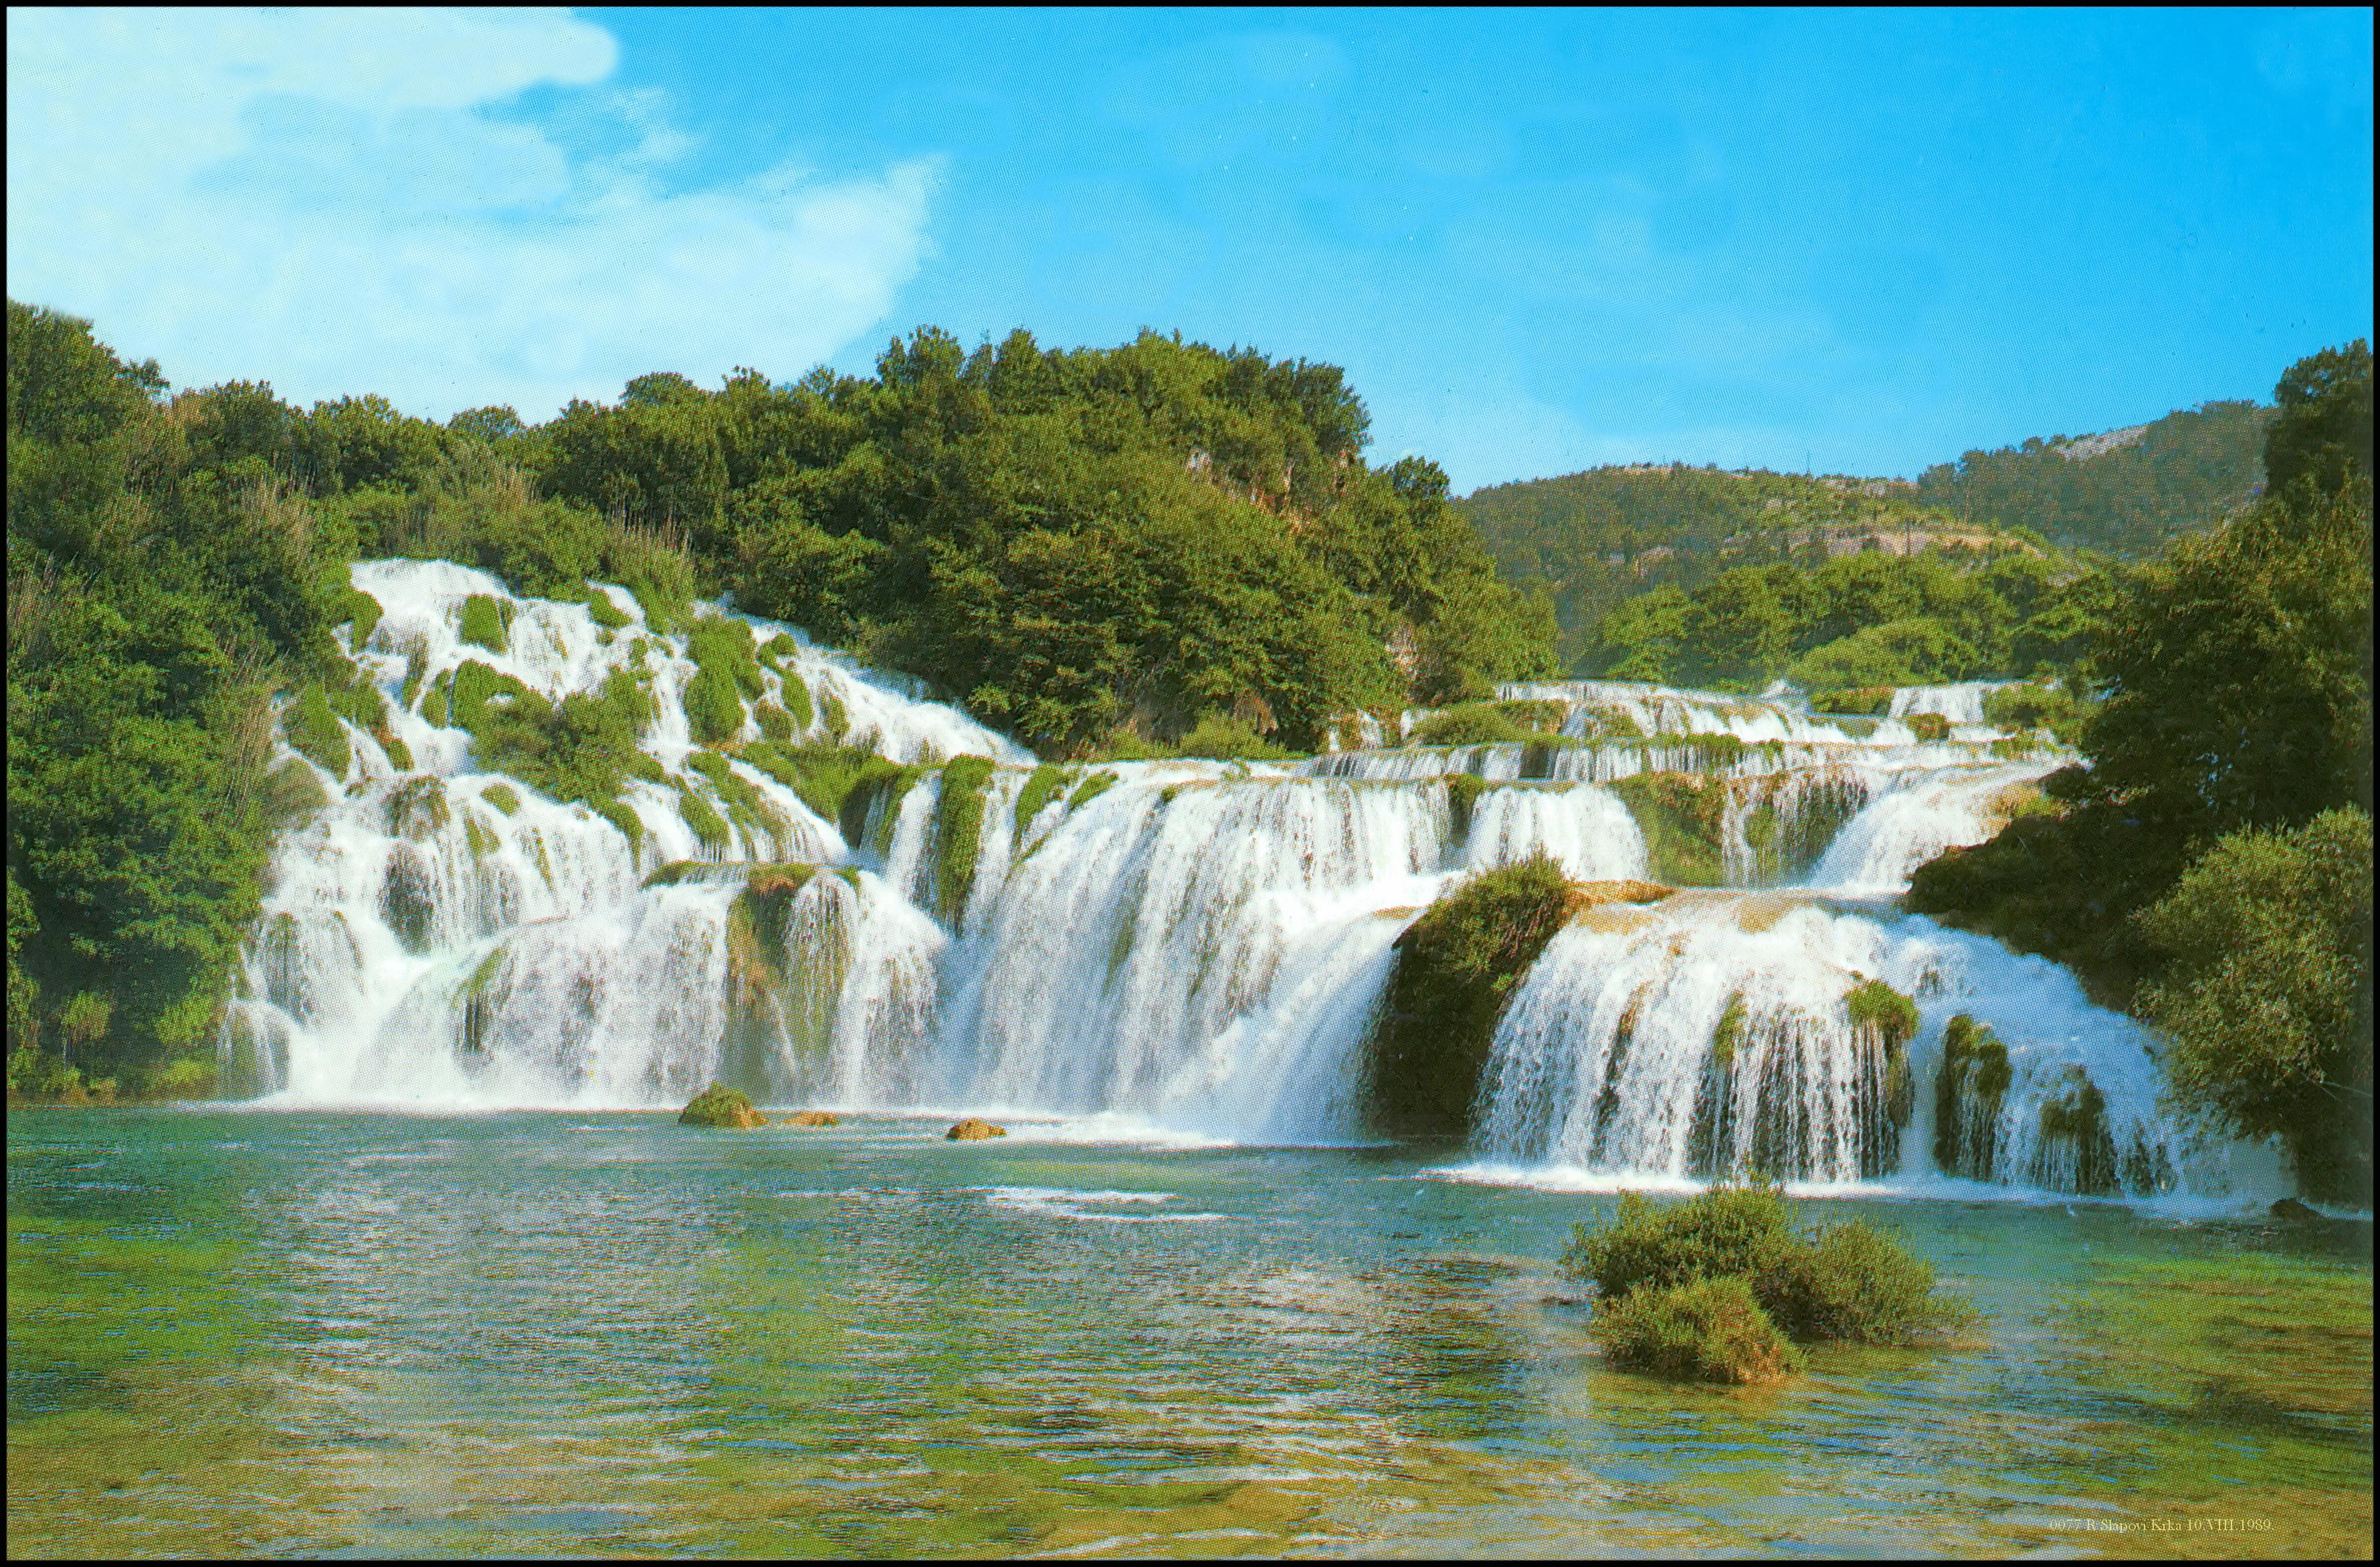 Waterfalls at Skradin © comphotosmorton